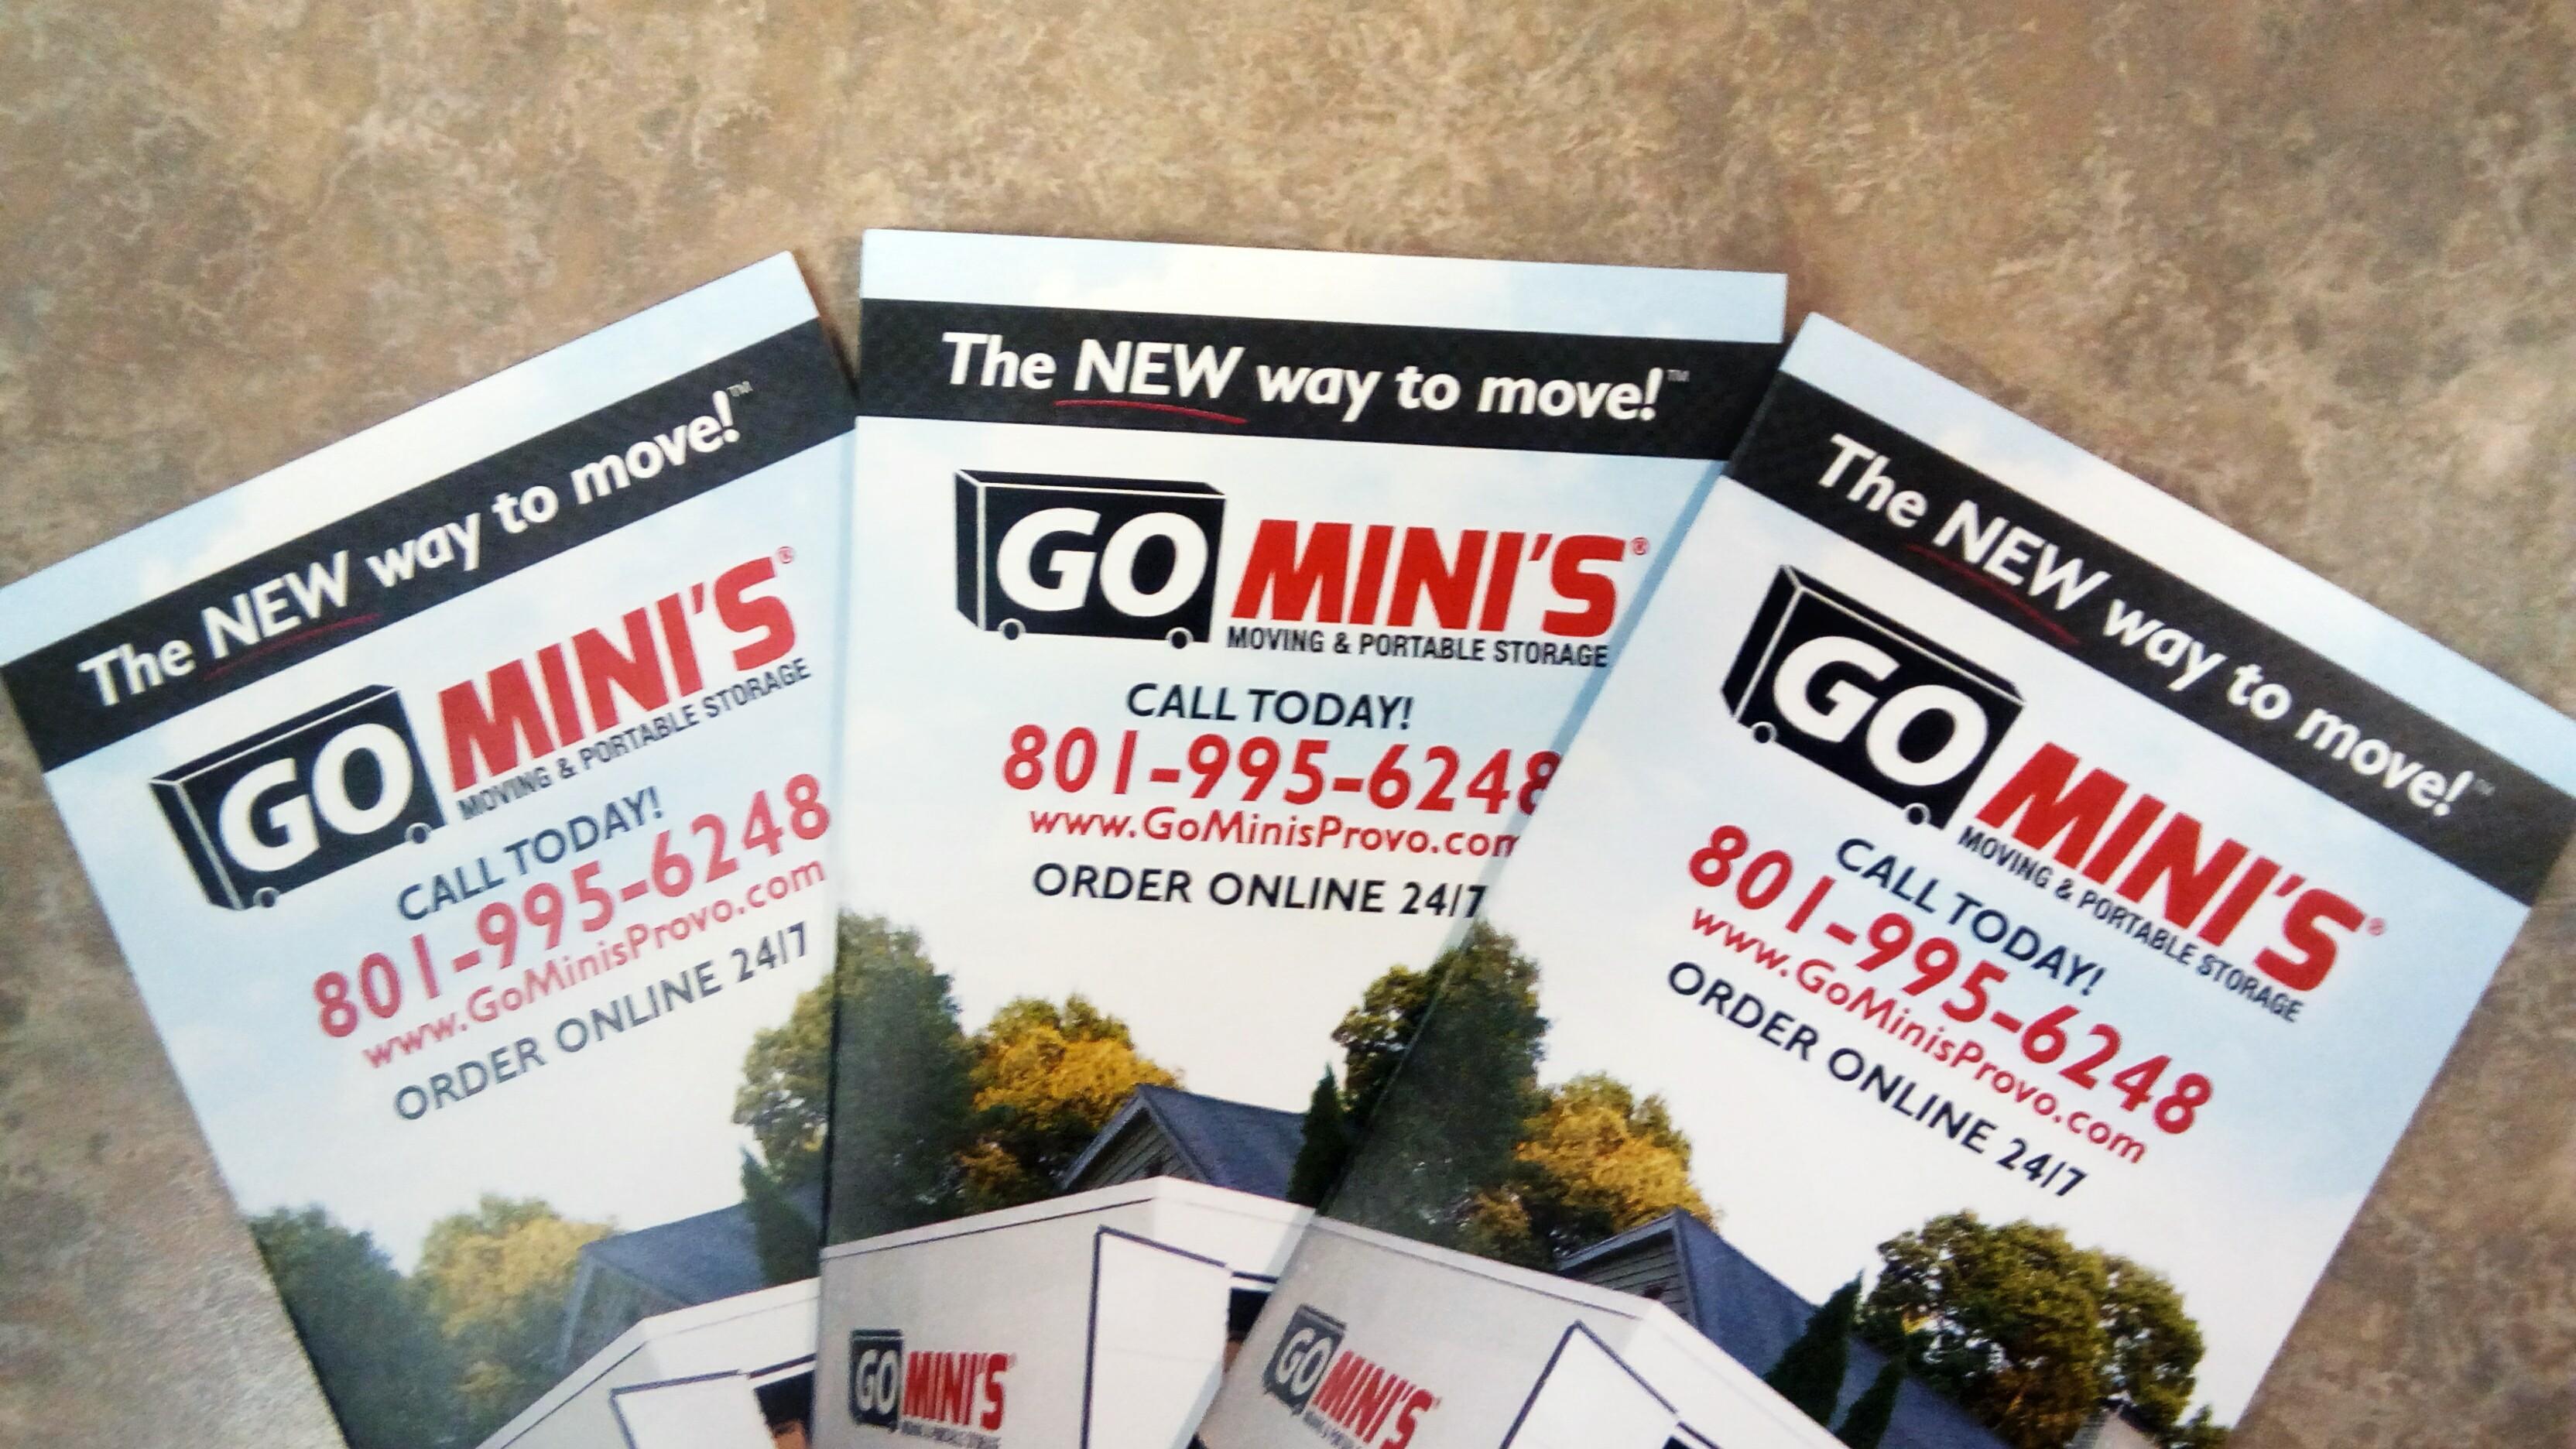 Go Mini's Moving & Portable Storage image 53